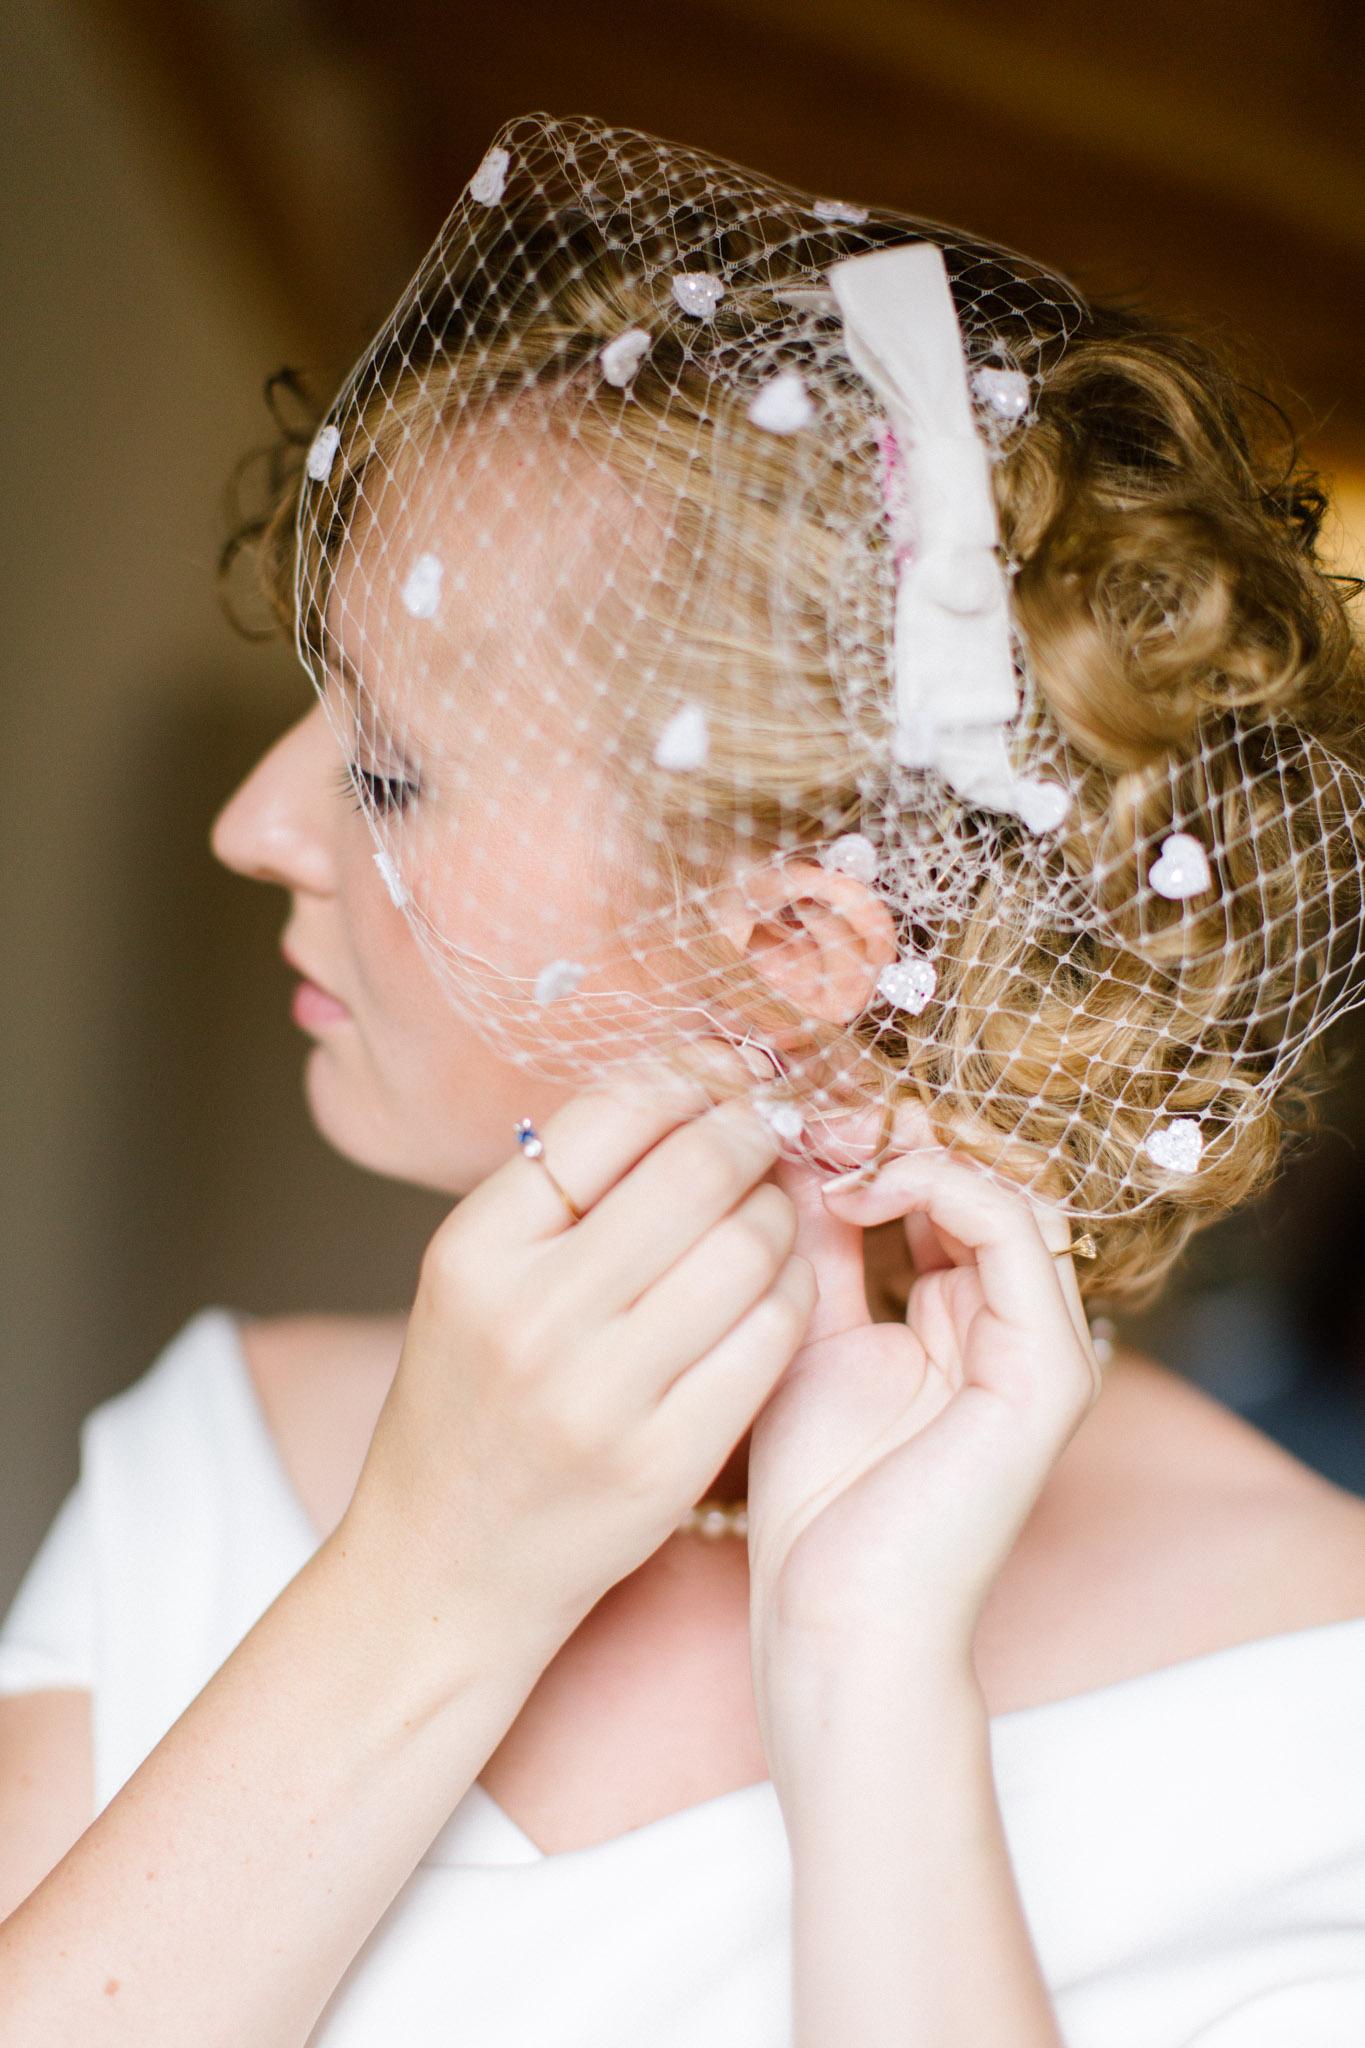 Lenl-Simmental-Buehlerhof-Pia-Anna-Christian-Wedding-Photography-EK-19.jpg